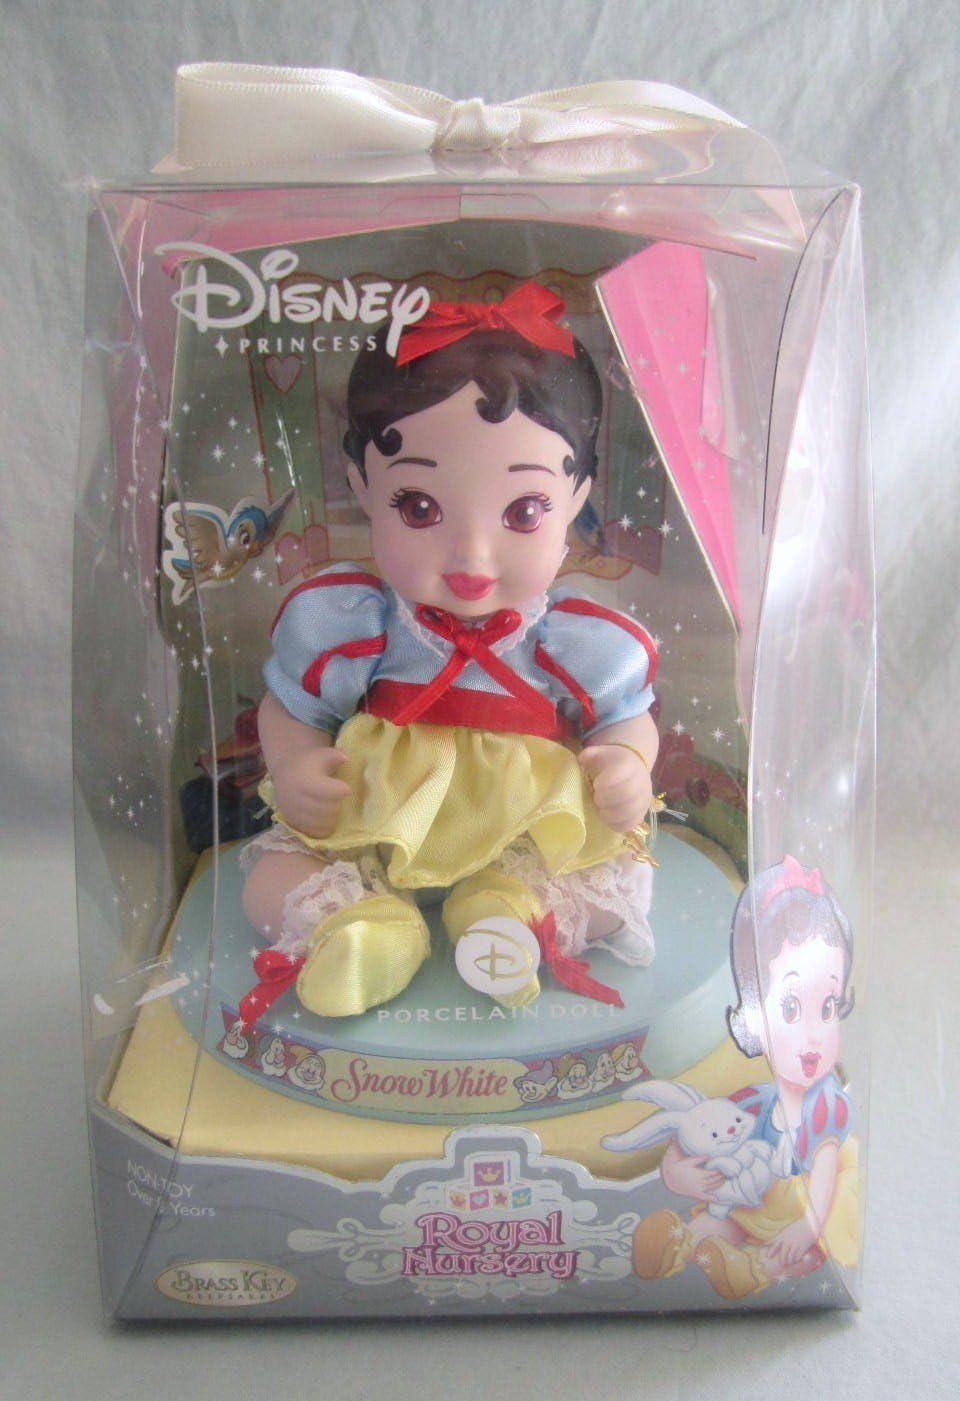 Disney 2006 Brass Key Keepsakes - Royal Nursery Princess Snow White Porcelain Doll